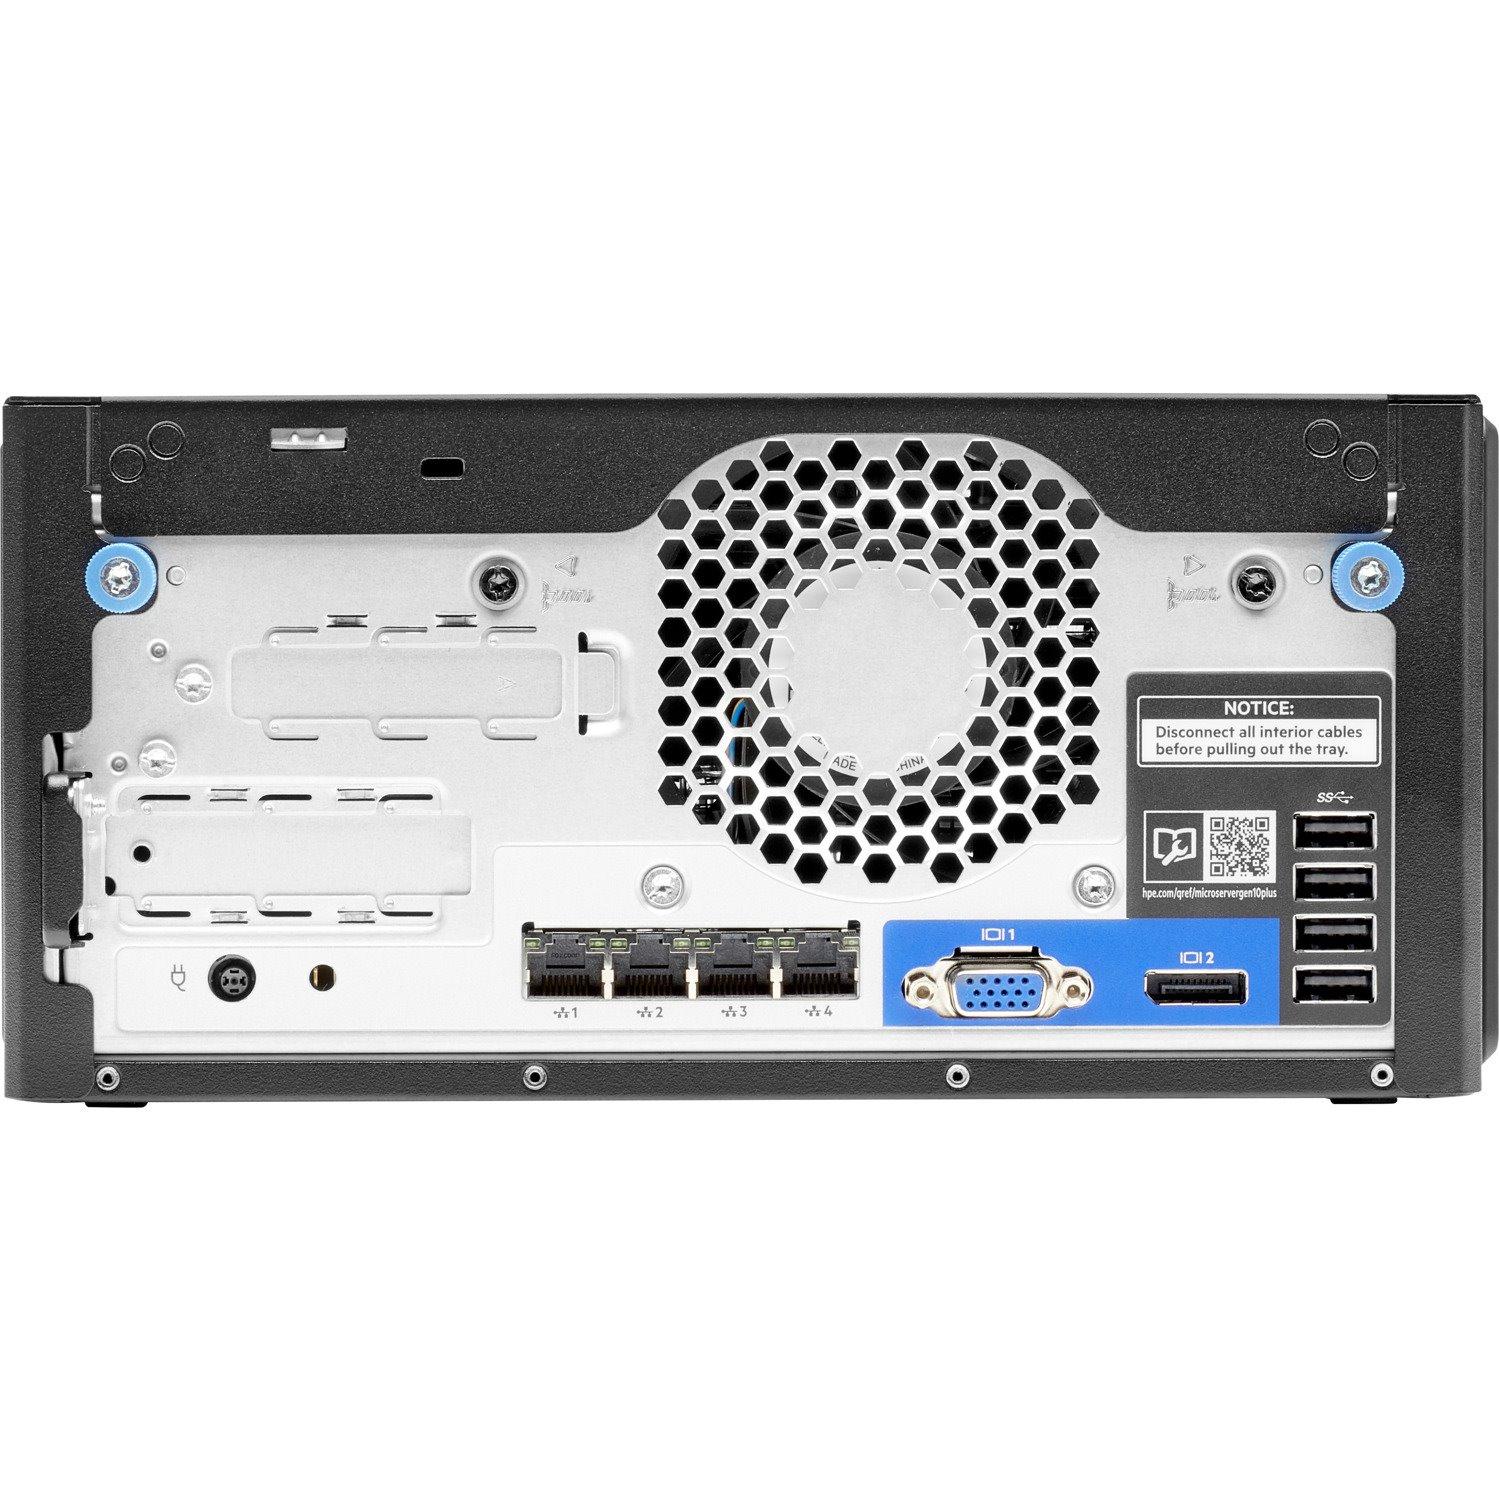 HPE ProLiant MicroServer Gen10 Plus Ultra Micro Tower Server - Intel C242 SoC - 1 x Intel Xeon E-2224 3.40 GHz - 16 GB RAM - Serial ATA/600 Controller